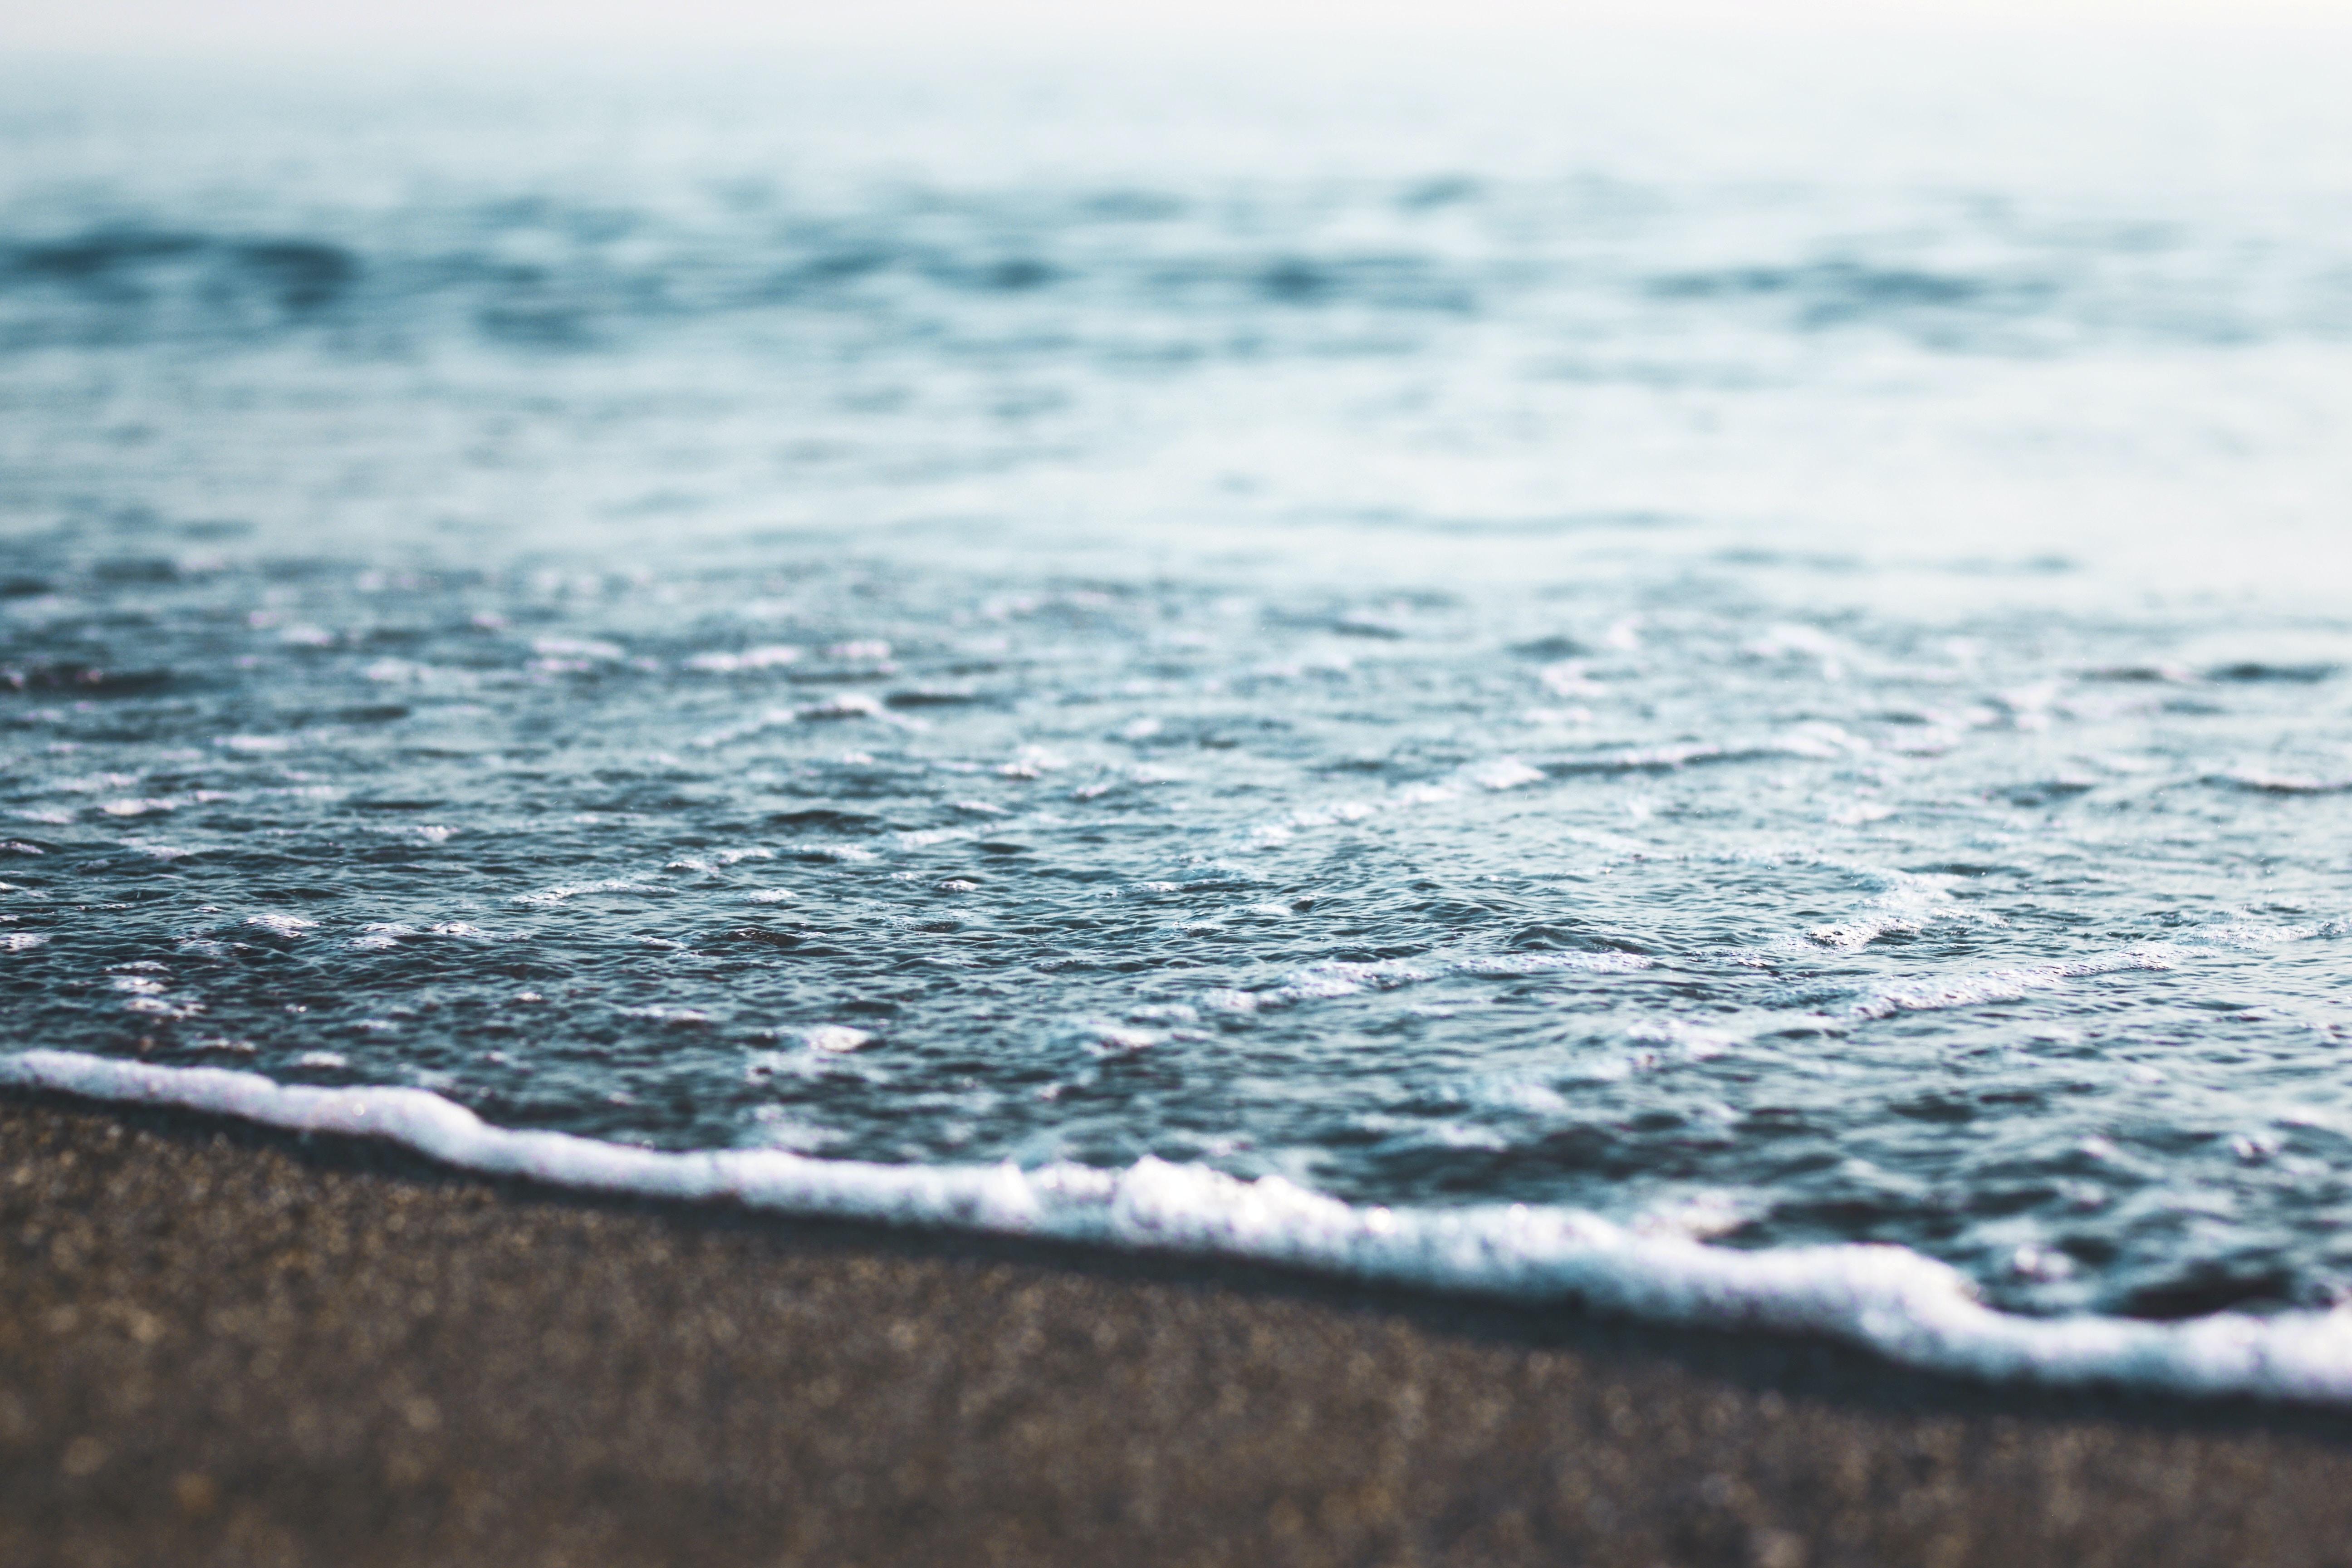 Ocean washing up on small pebble beach in Salobreña